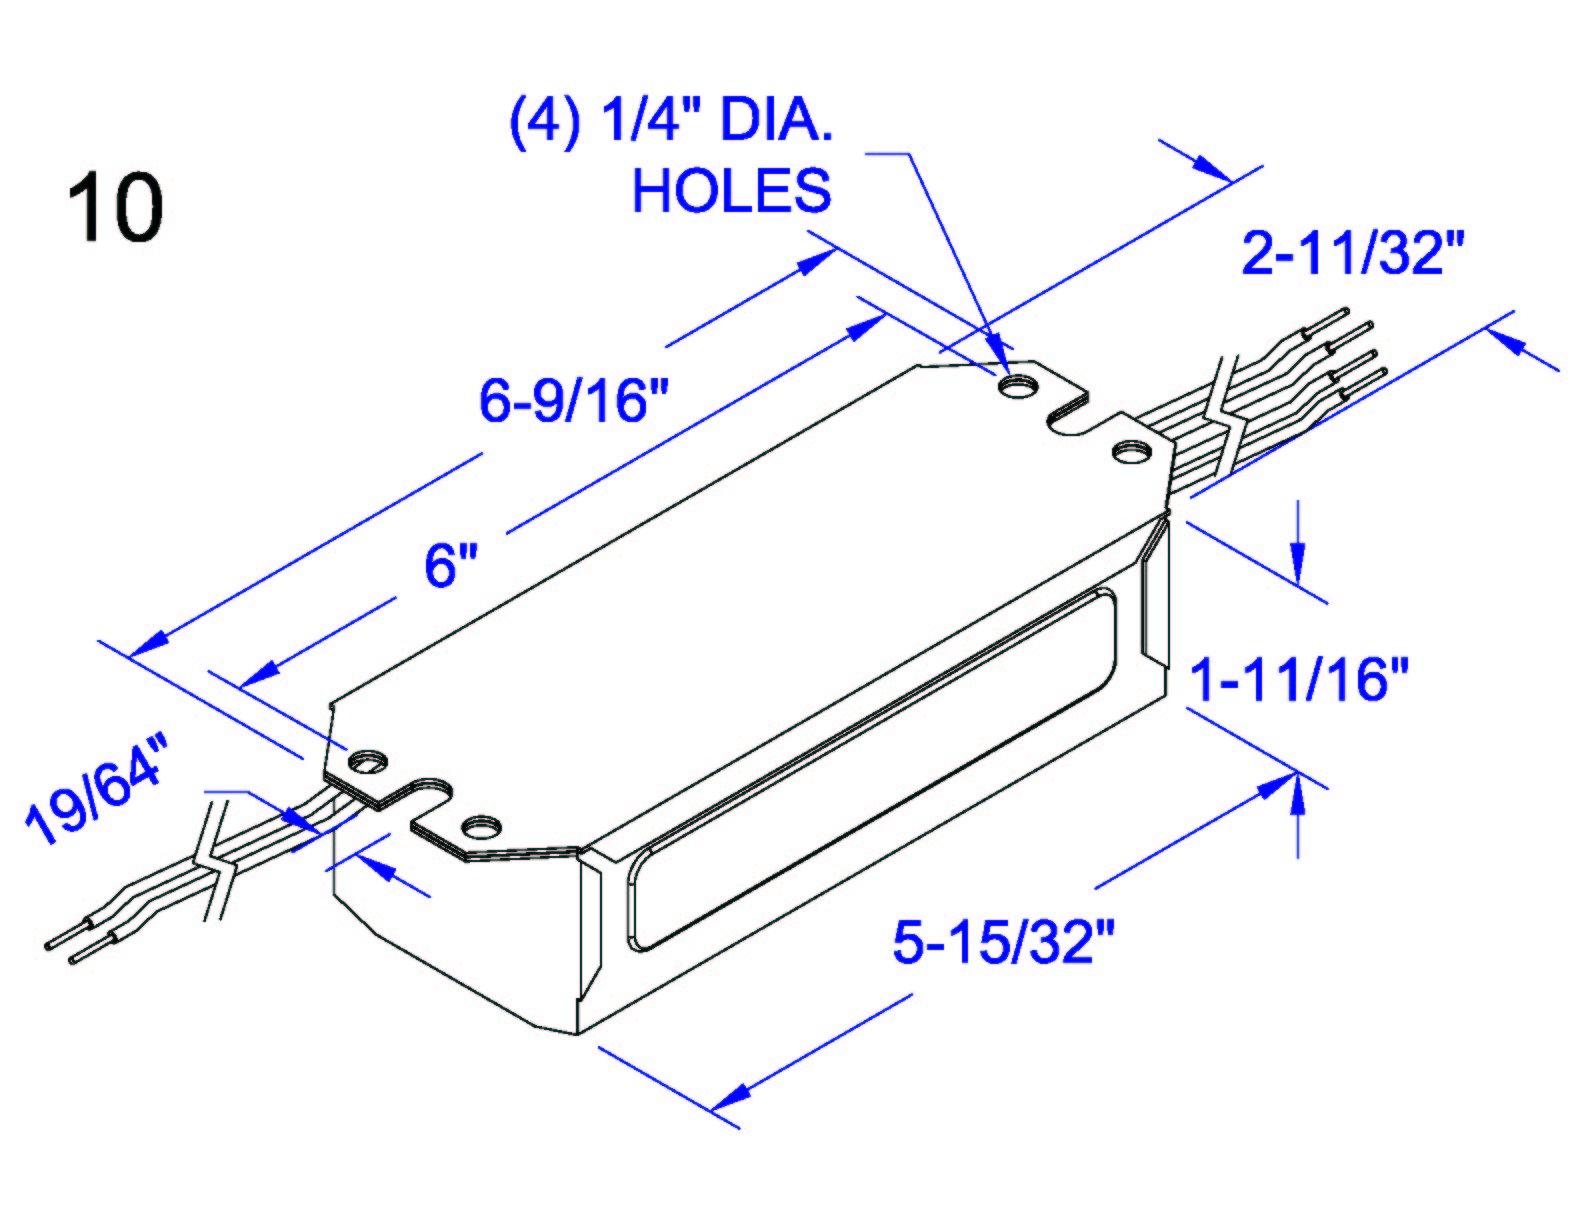 ROBERTSON 3M10249 NES315P /A mBallast, NPF, 120Vac., 60Hz, (3) F15T8, V2